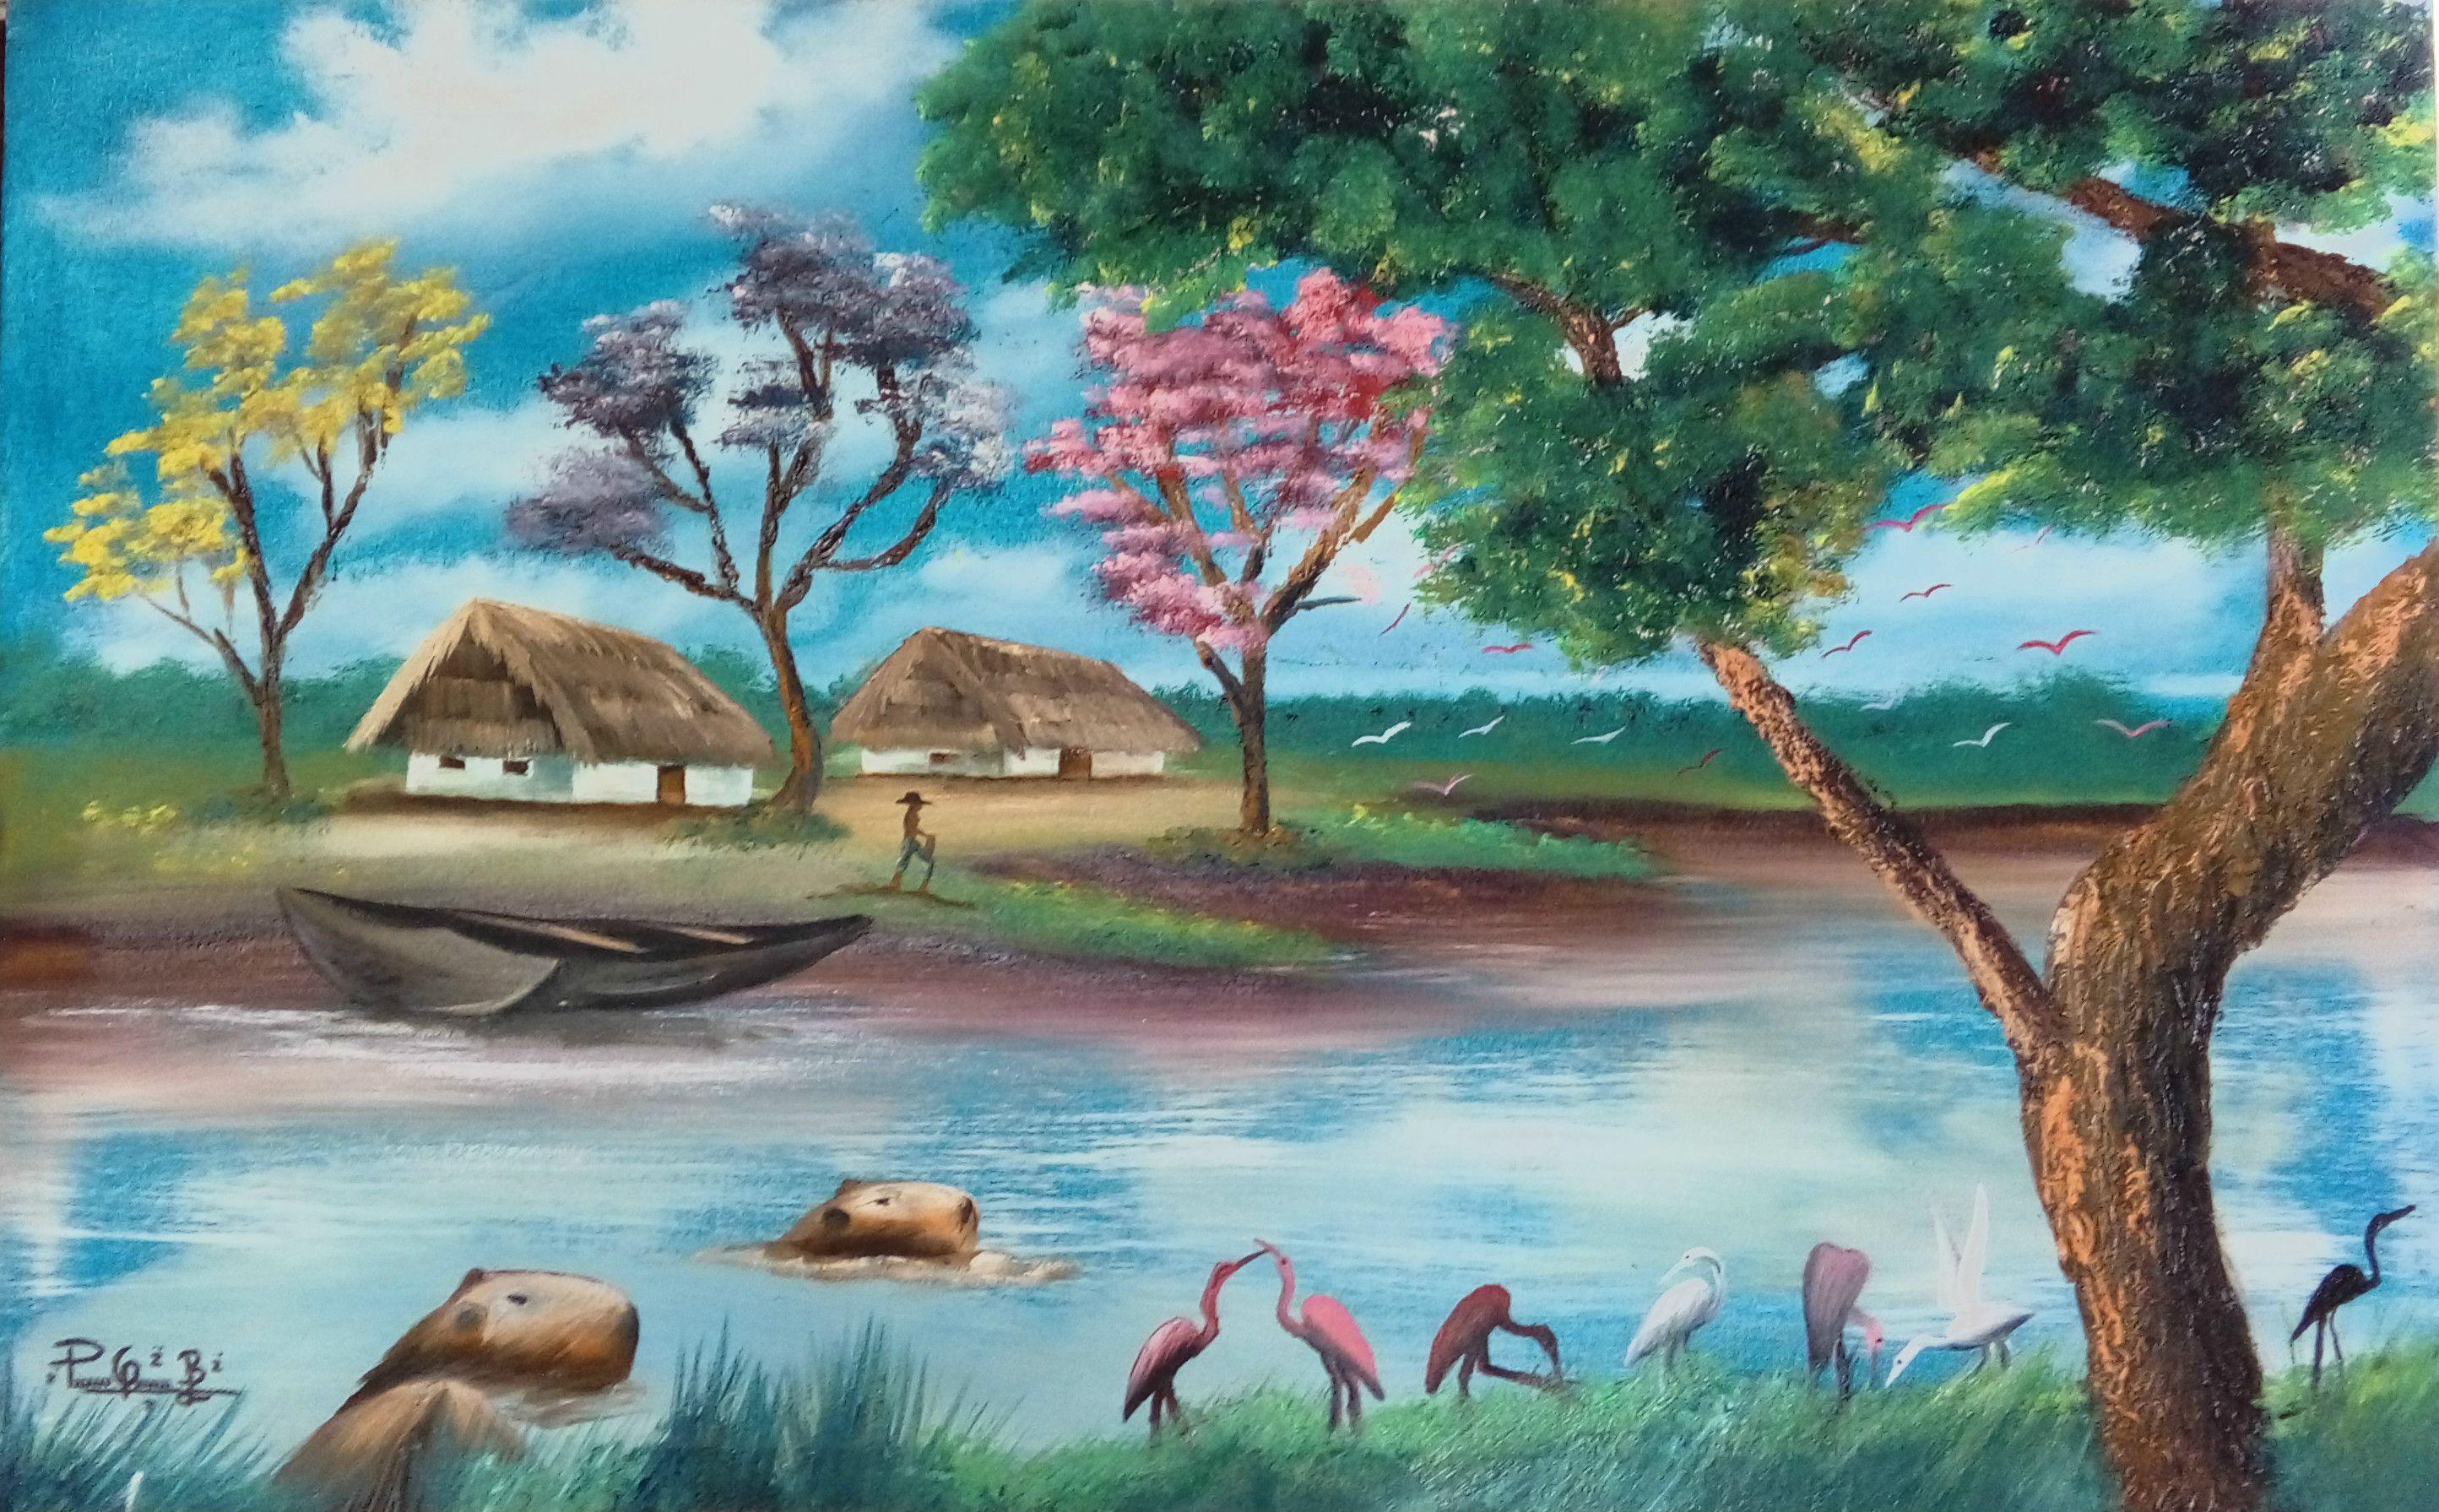 Paisajes Animales Y Arte De Mi Llano Paisajes Llaneros Dibujos Paisajes